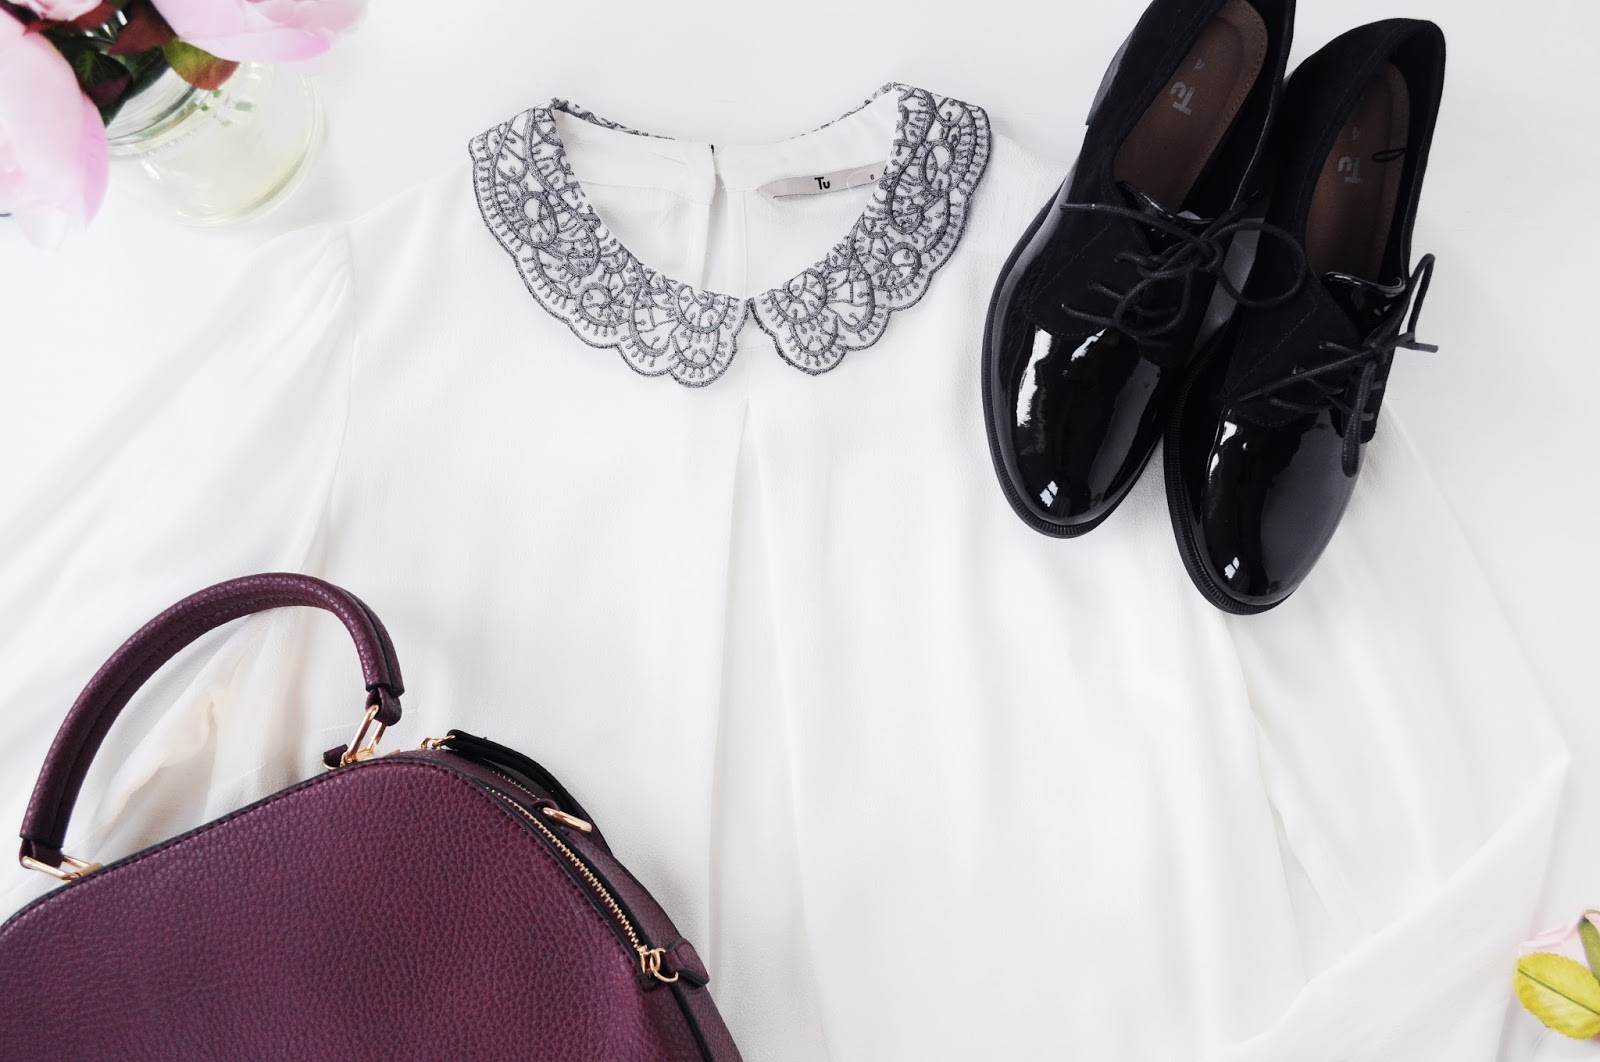 fashion on a budget, tu clothing